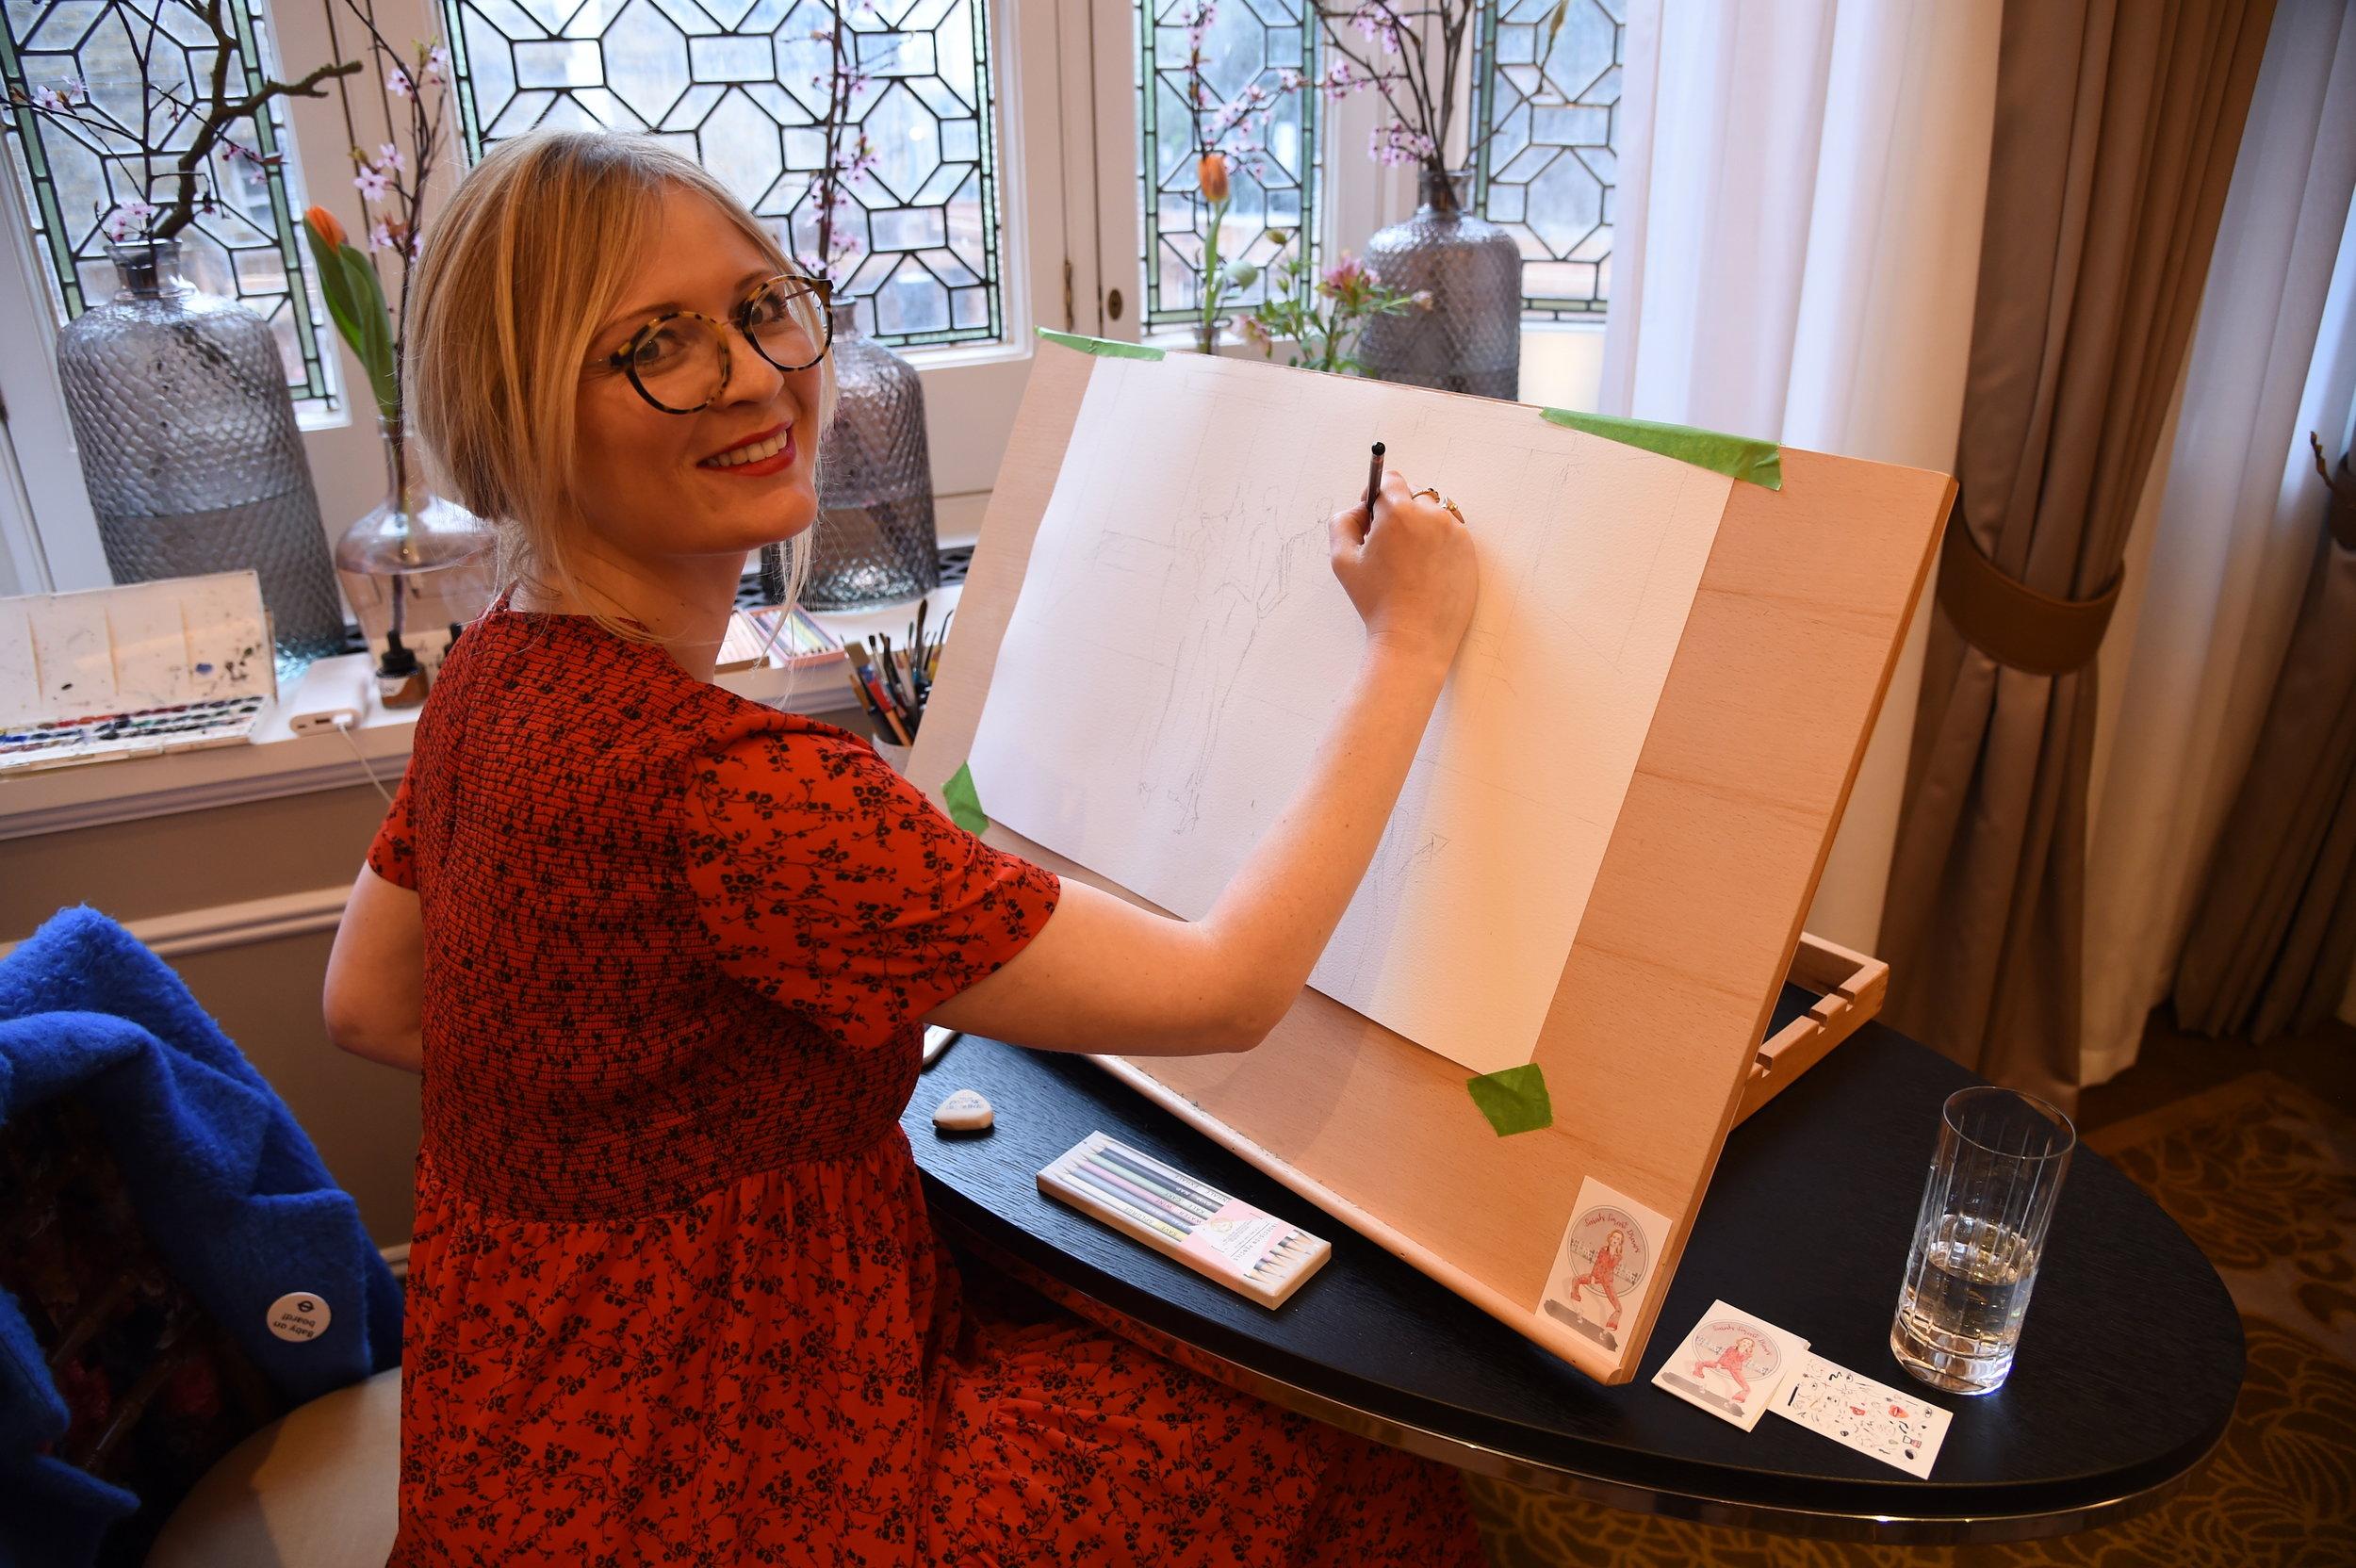 Live Fashion Illustrator, Sarah Smart